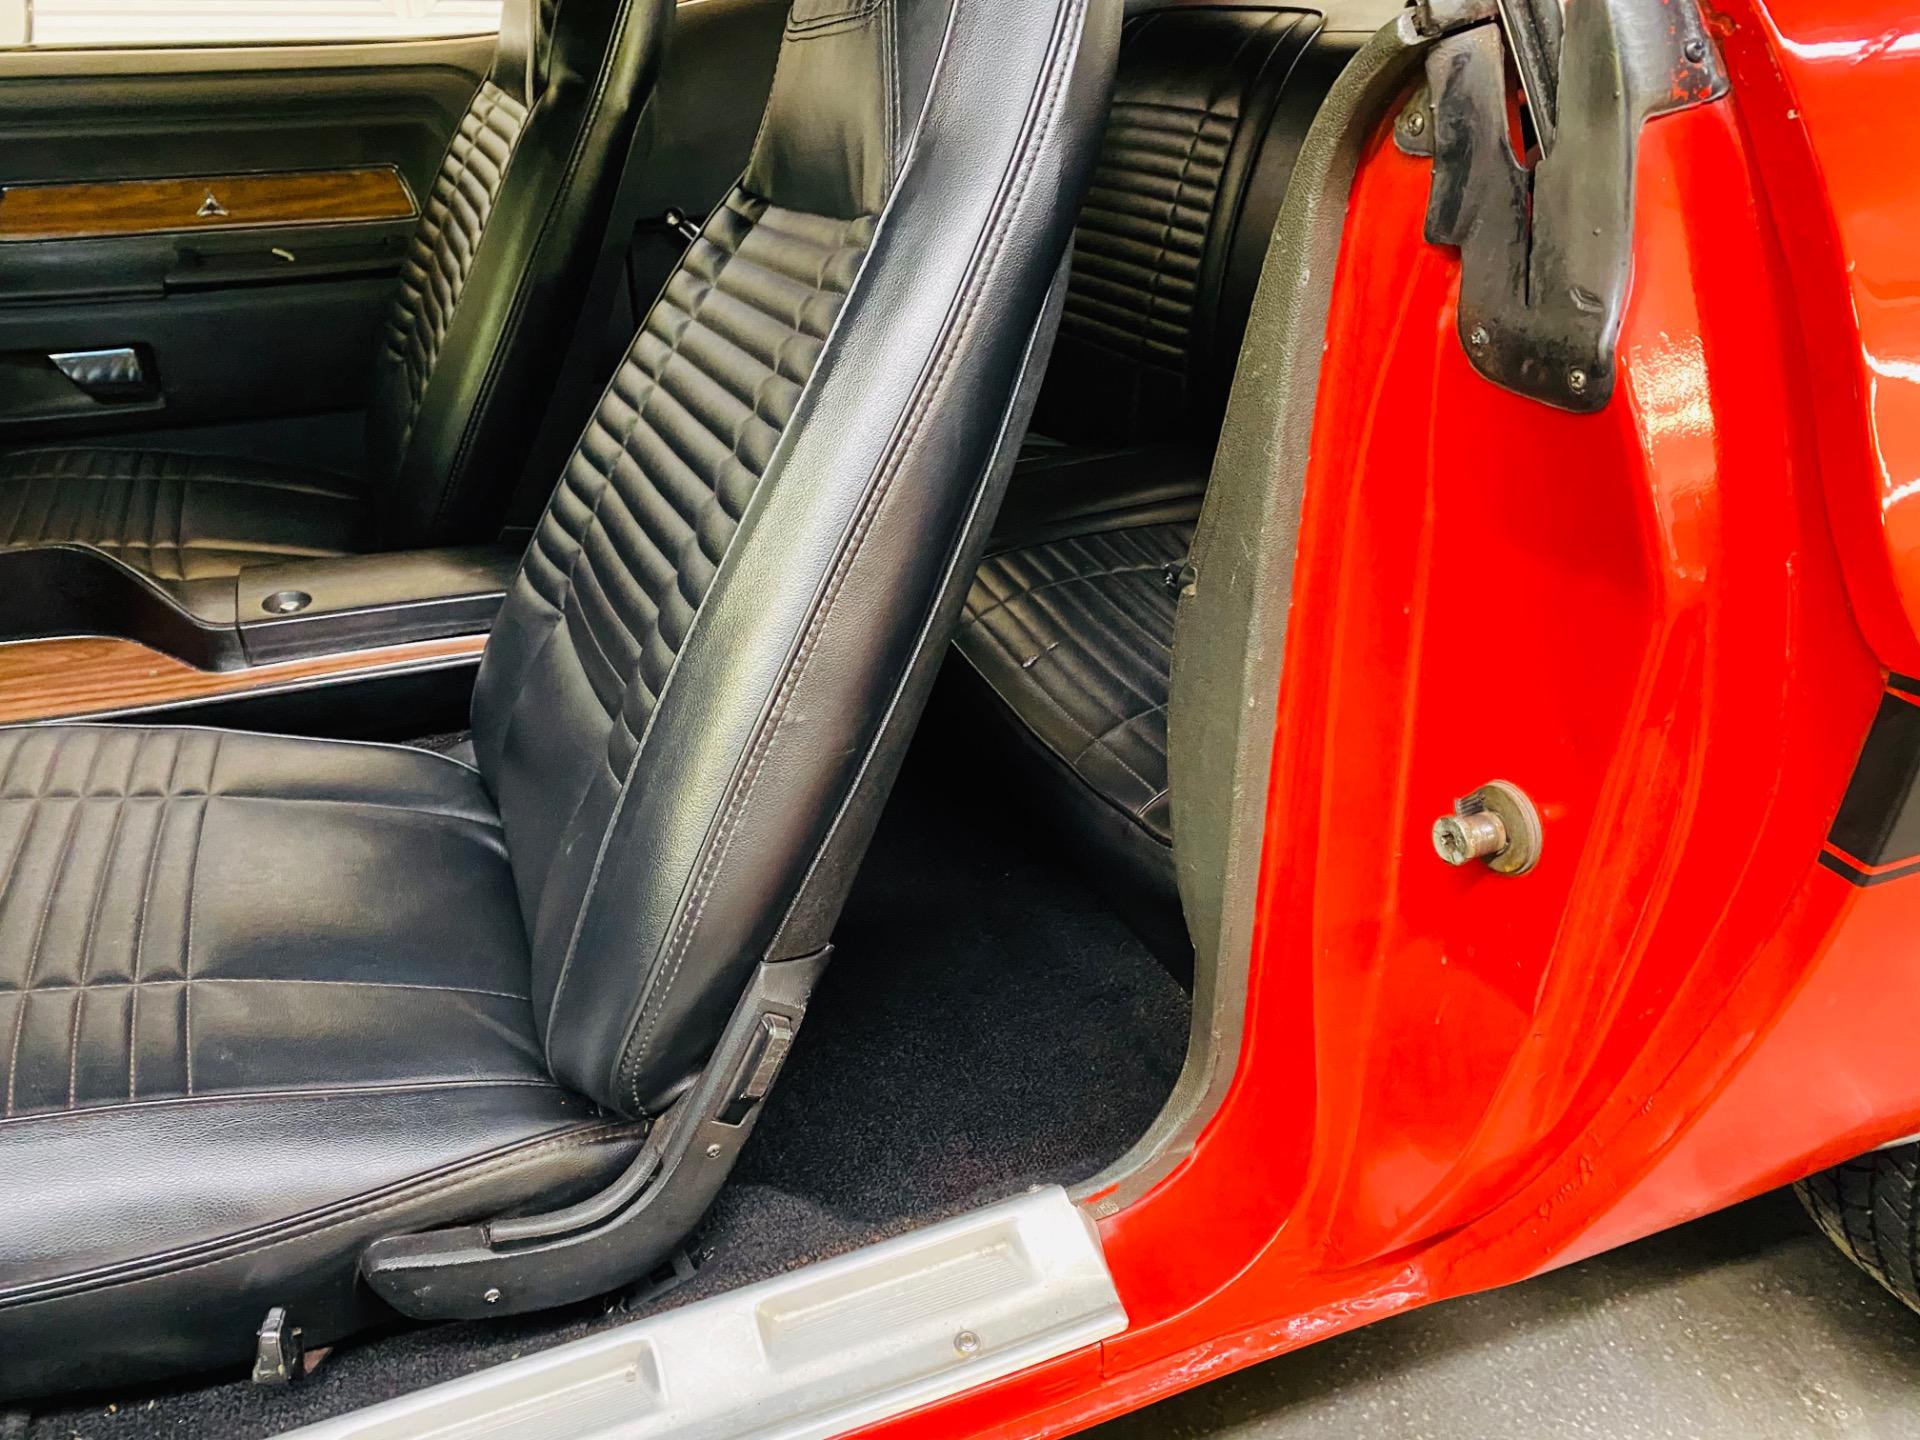 Used 1970 Dodge Challenger - 340 ENGINE - SUPER CLEAN - SEE VIDEO | Mundelein, IL